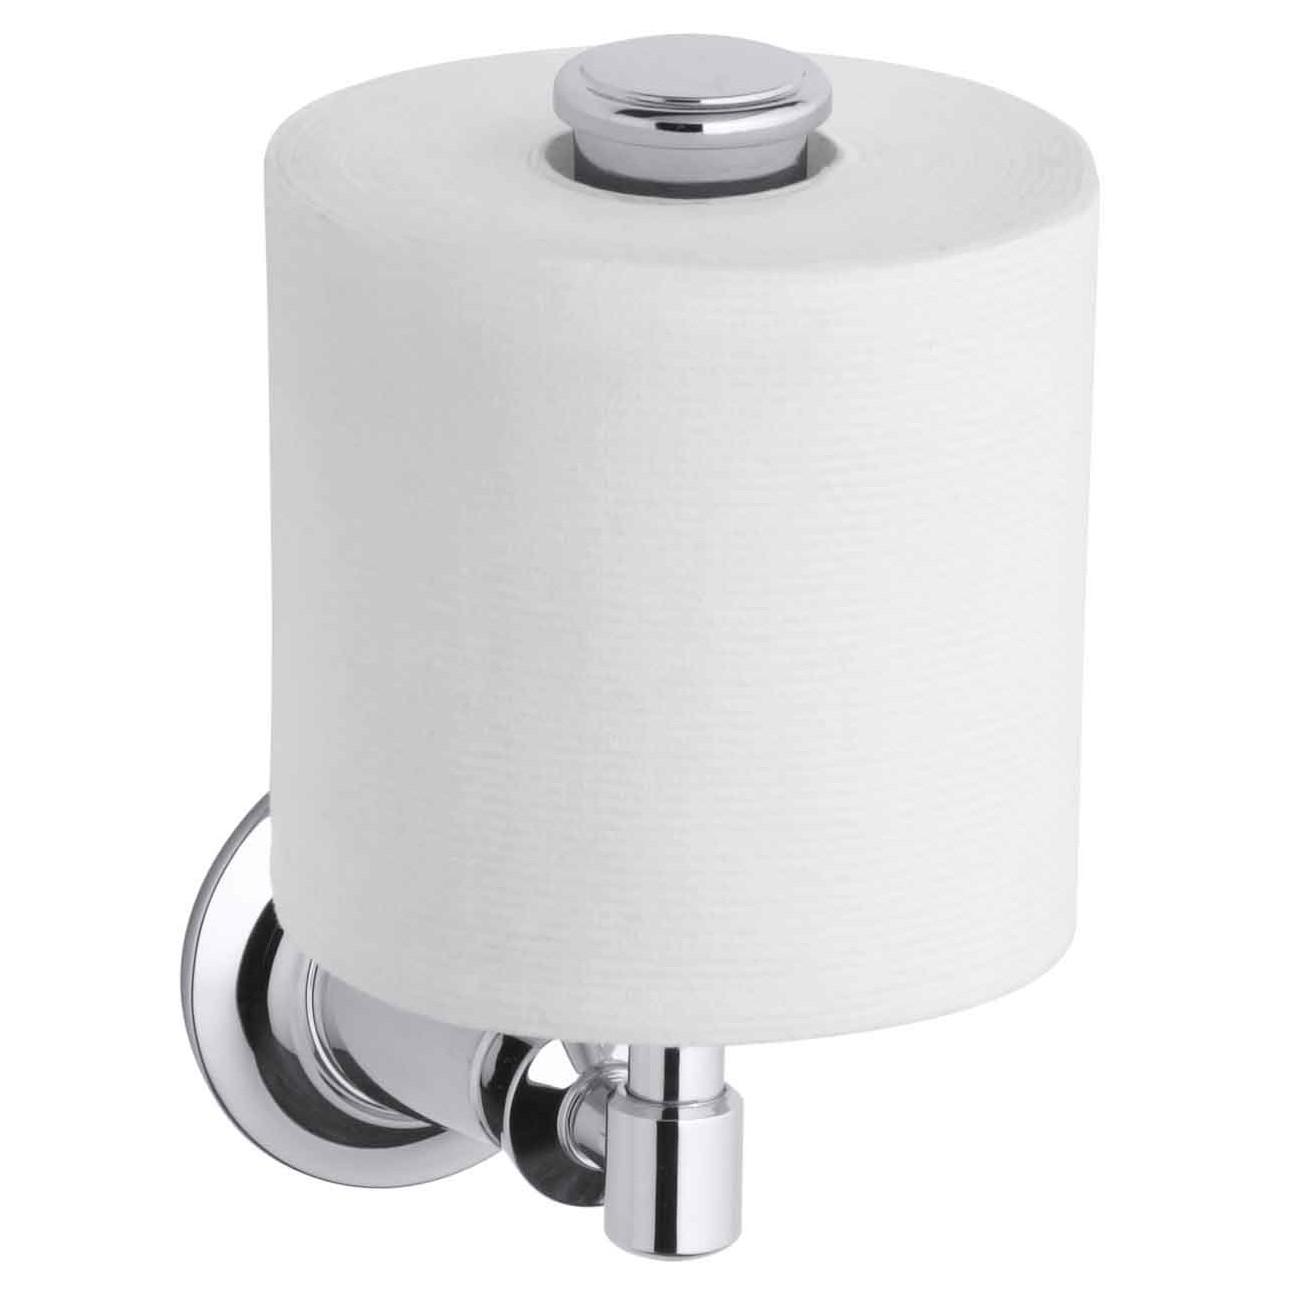 amazing vertical toilet paper holder homesfeed. Black Bedroom Furniture Sets. Home Design Ideas